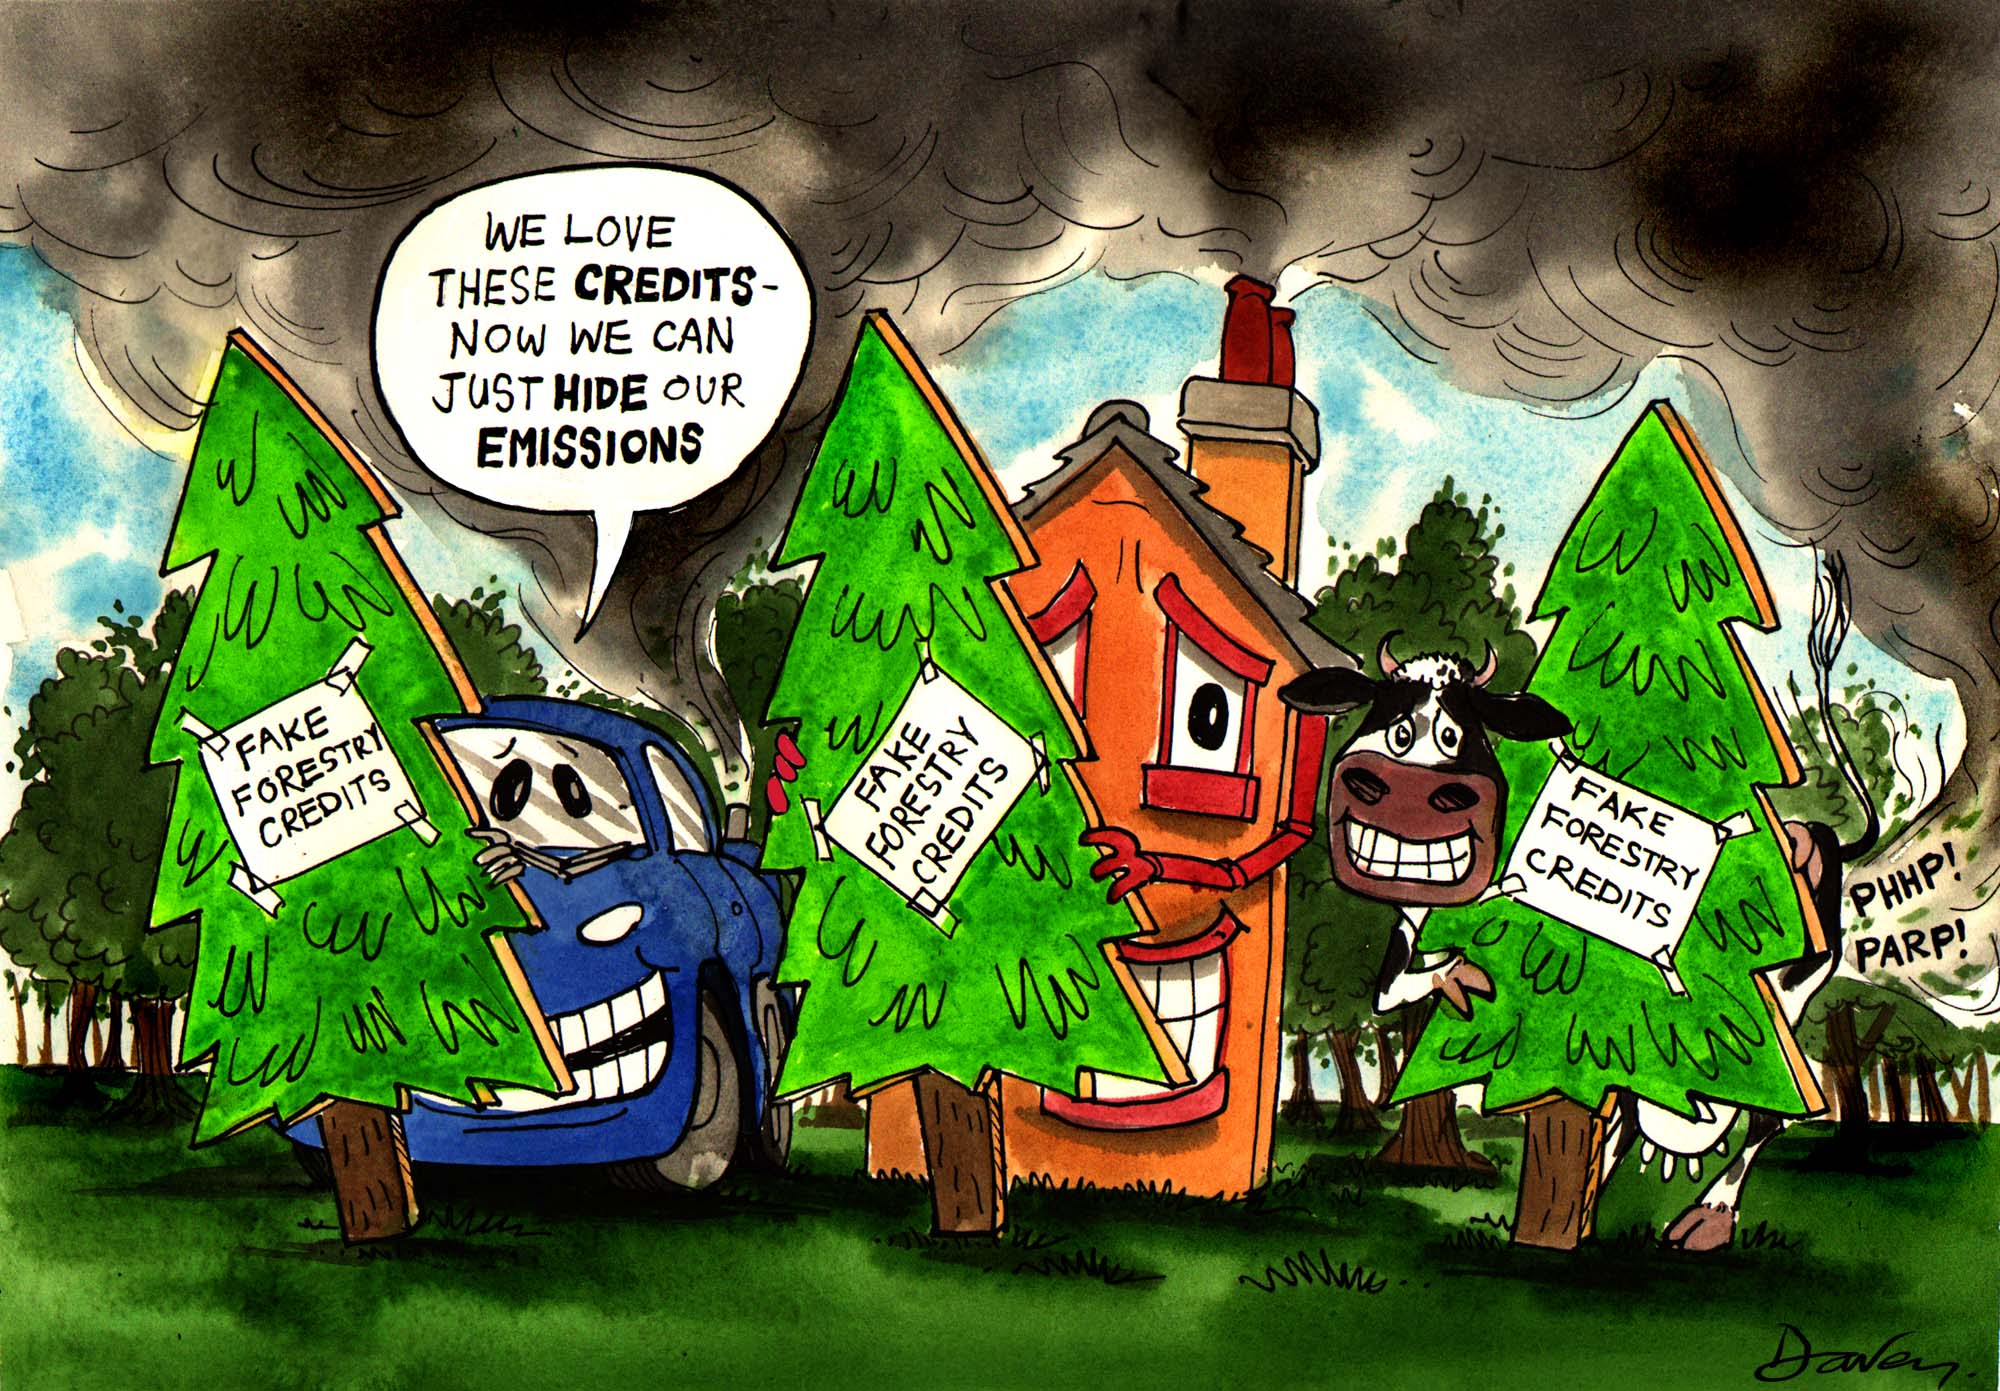 Fake_forestry_credits cartoon